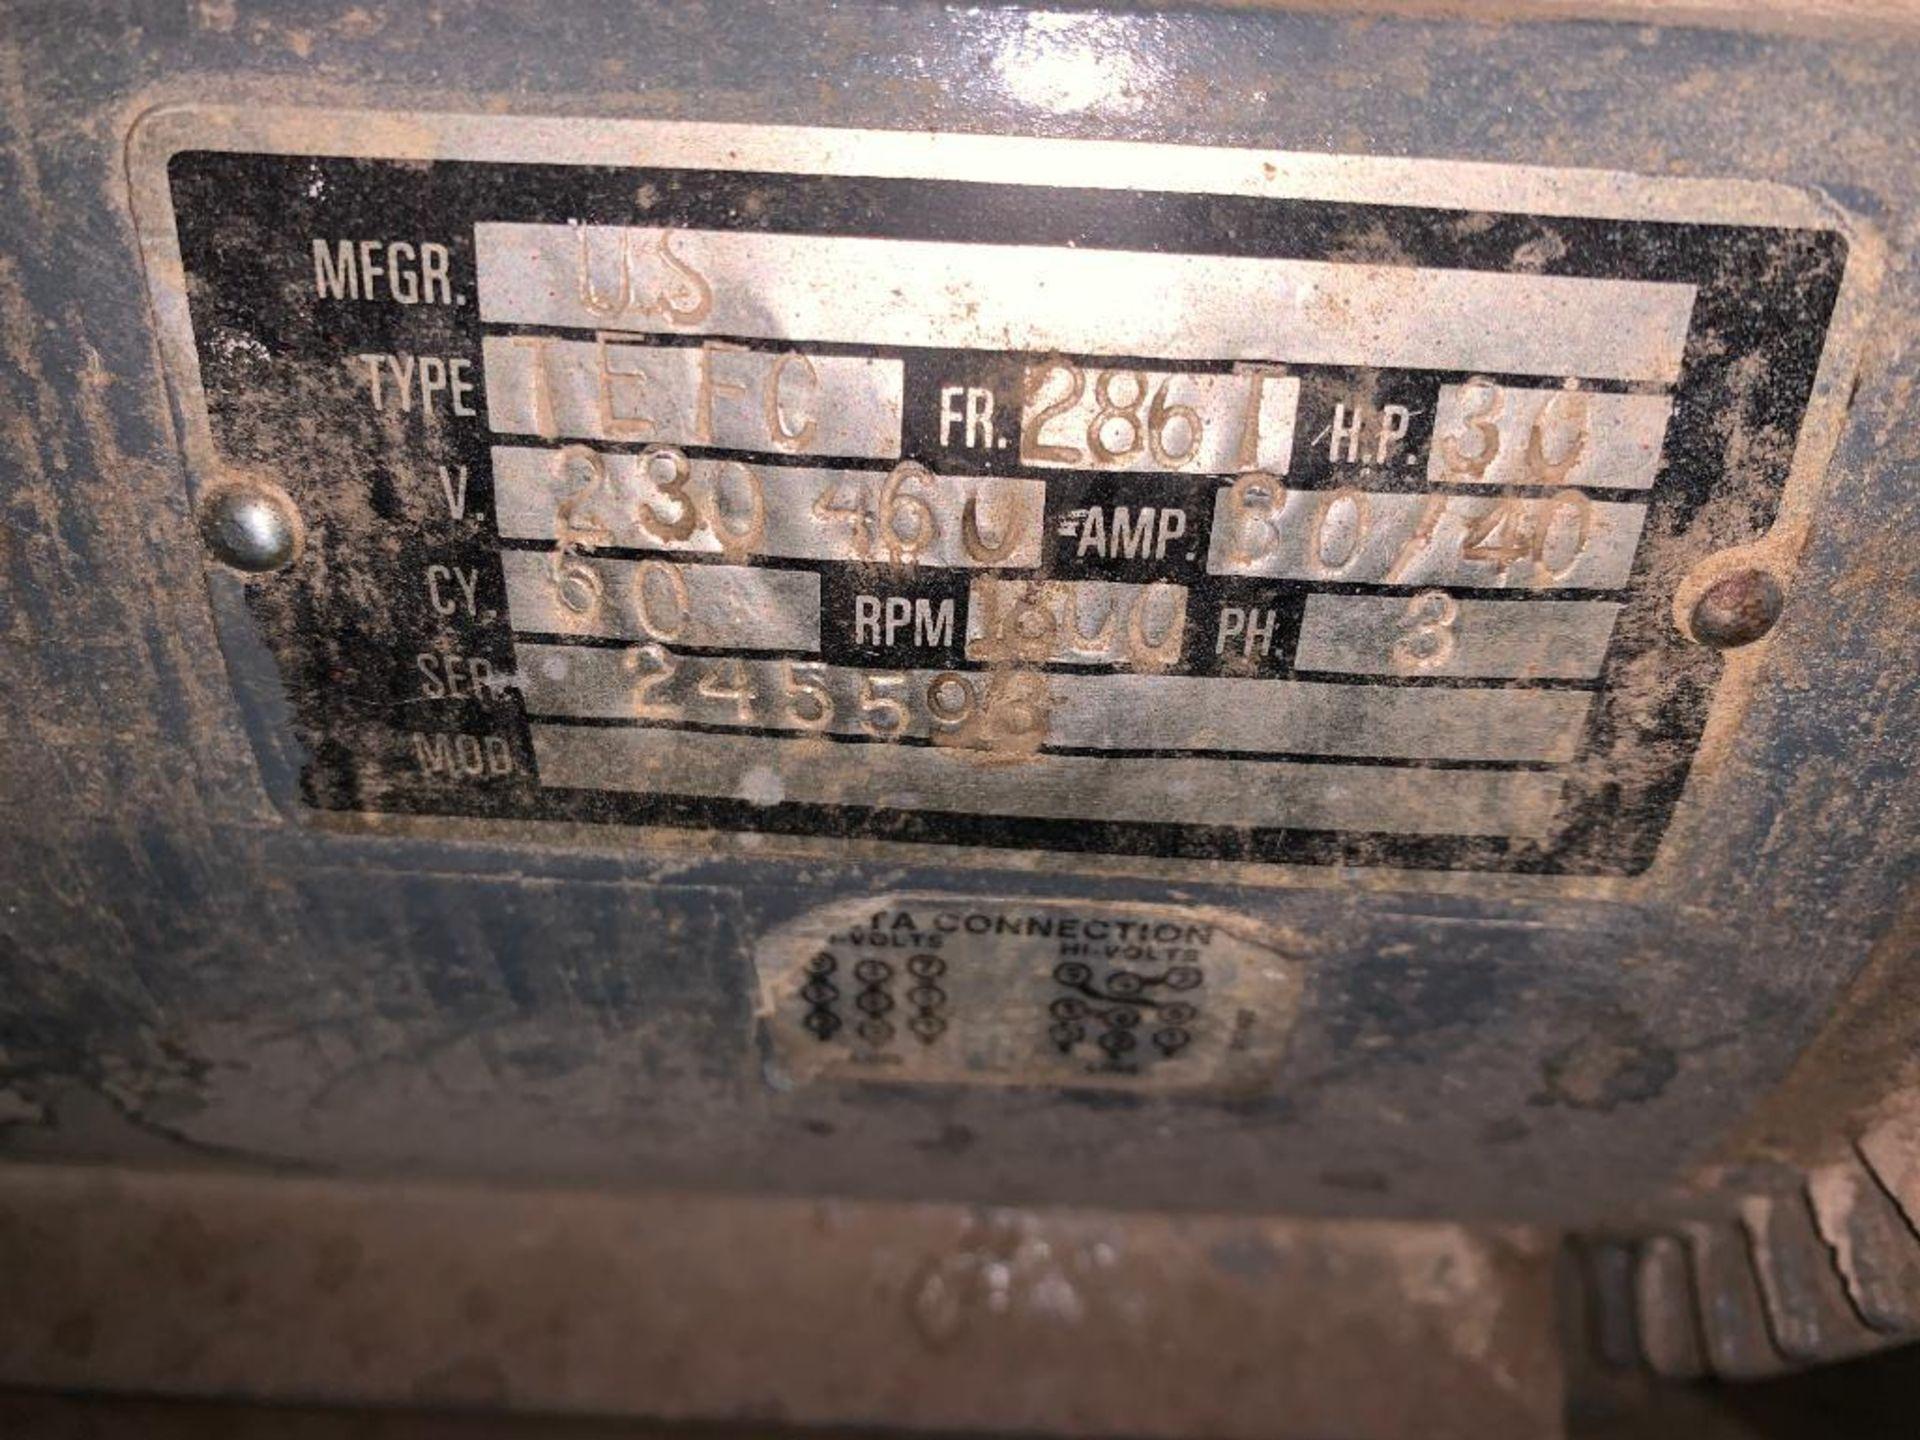 Ingersoll Dresser high temperature water pump - Image 3 of 5